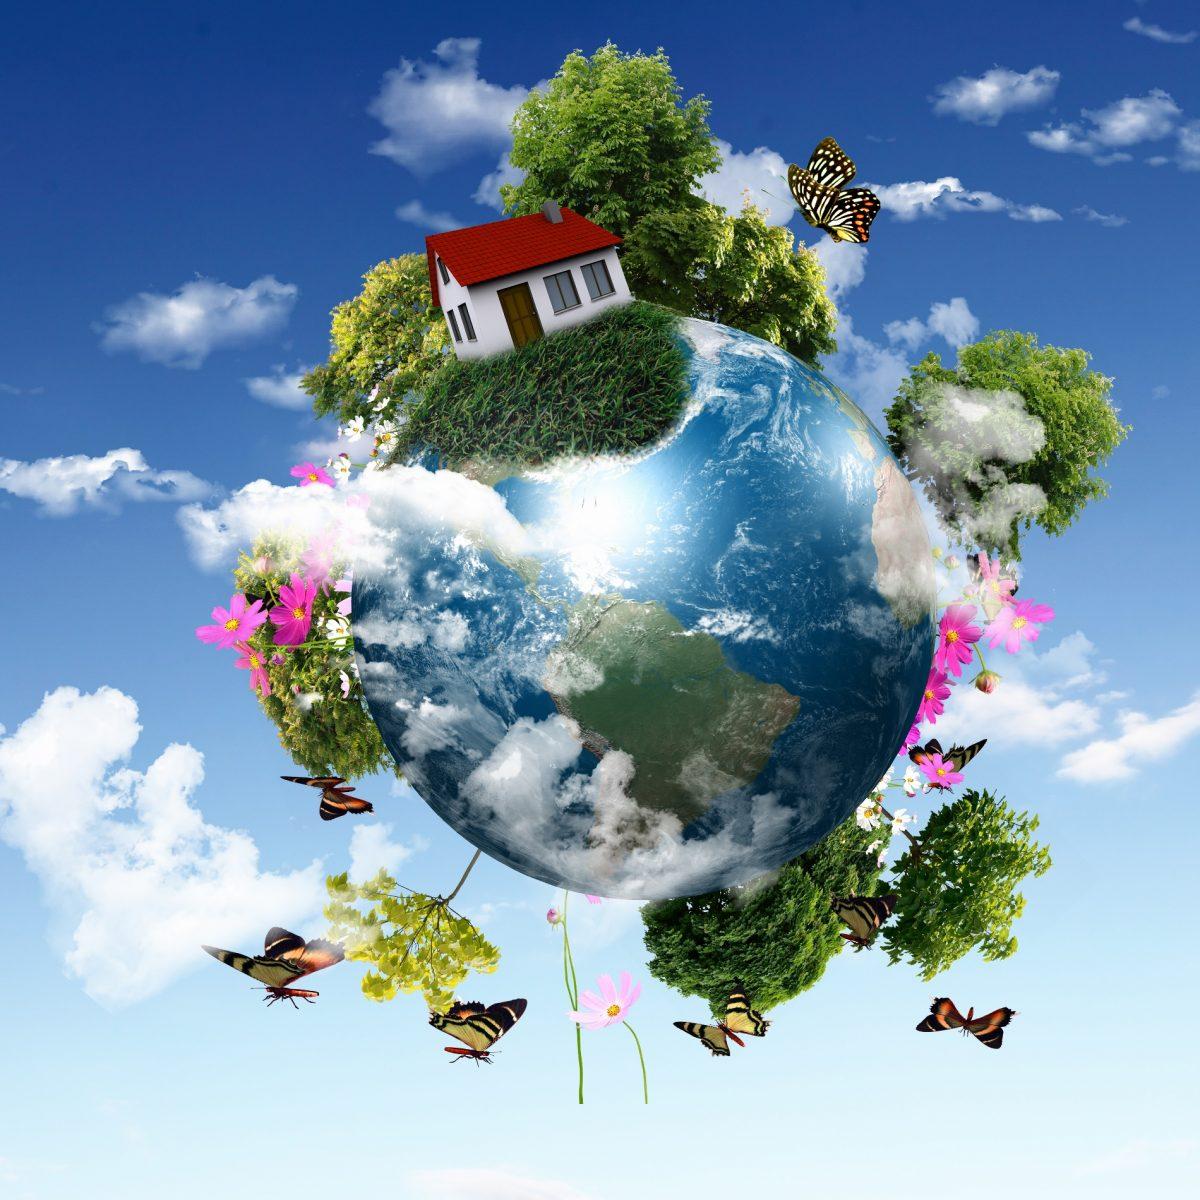 mondo-verde